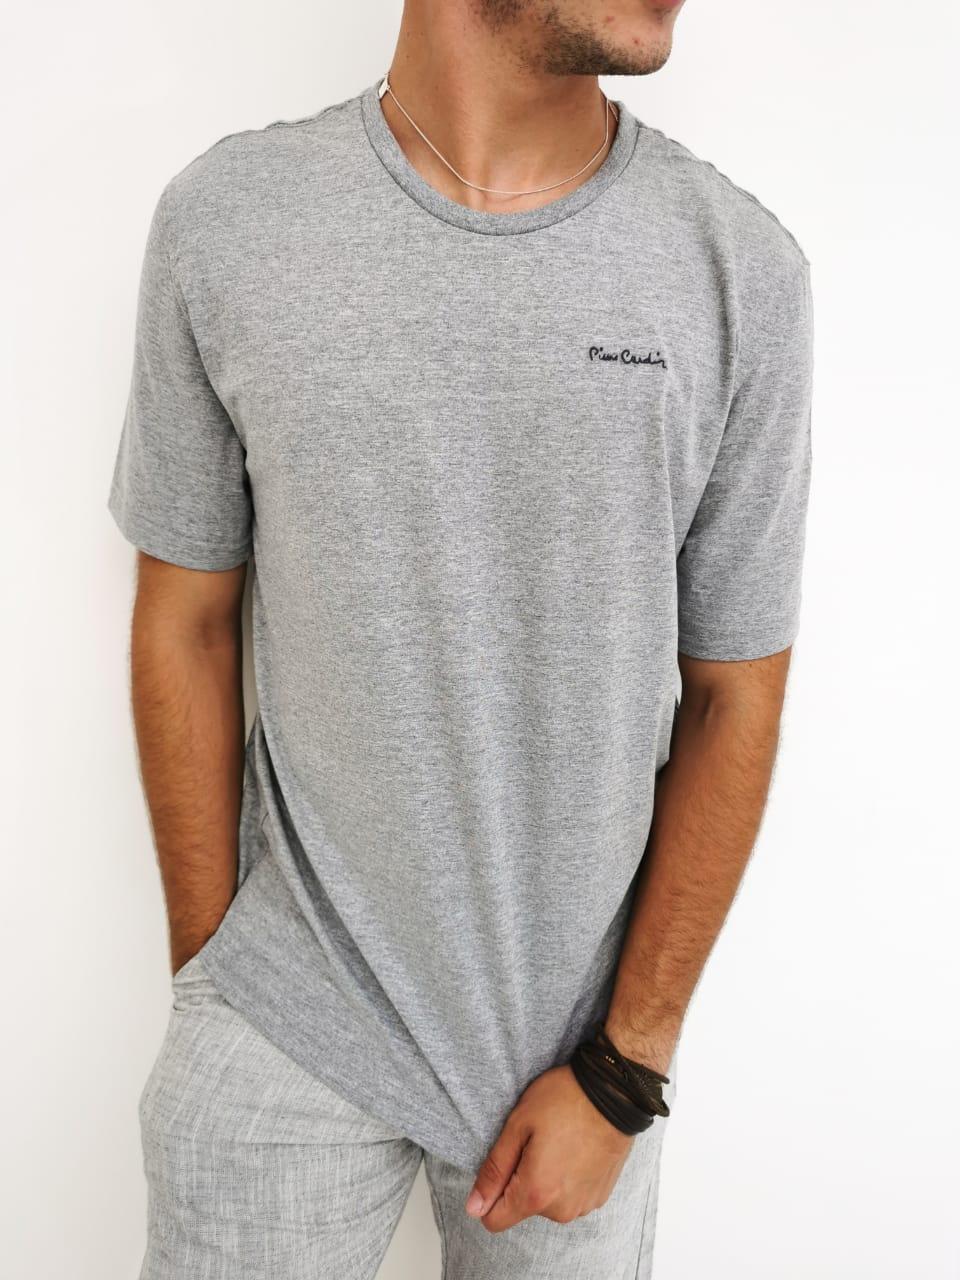 Camiseta Pierre Cardin Cinza Mescla